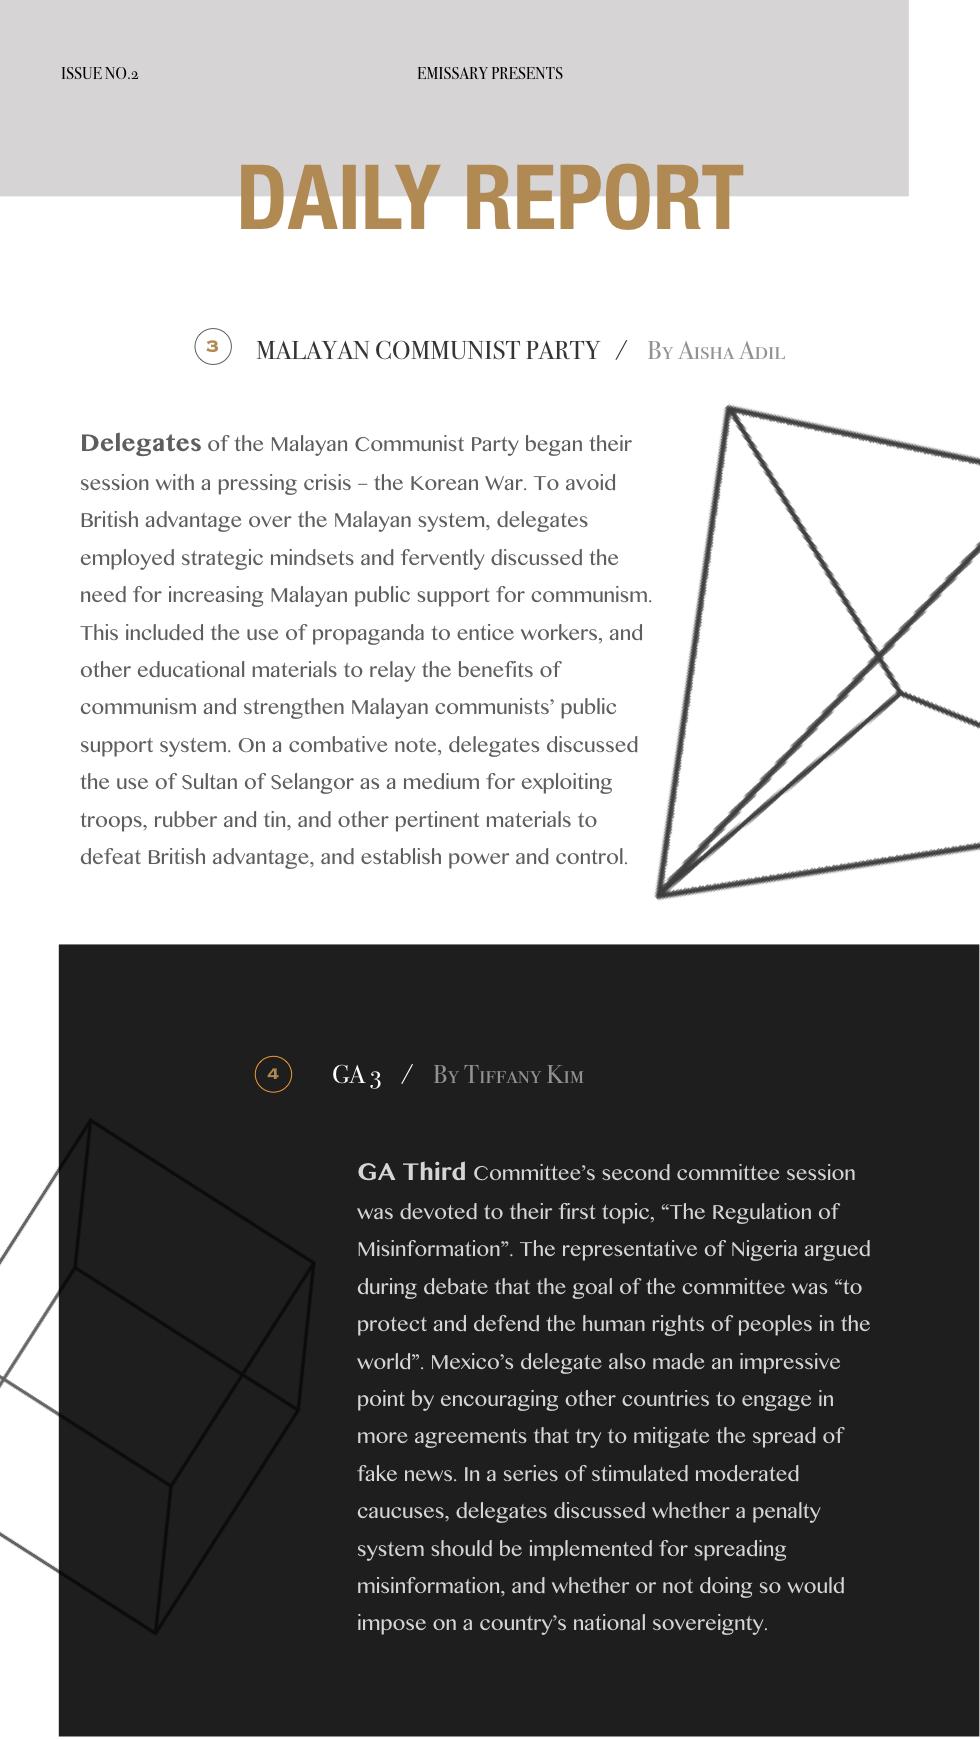 NAMUN Newsletter #2 (jpeg).003.jpeg